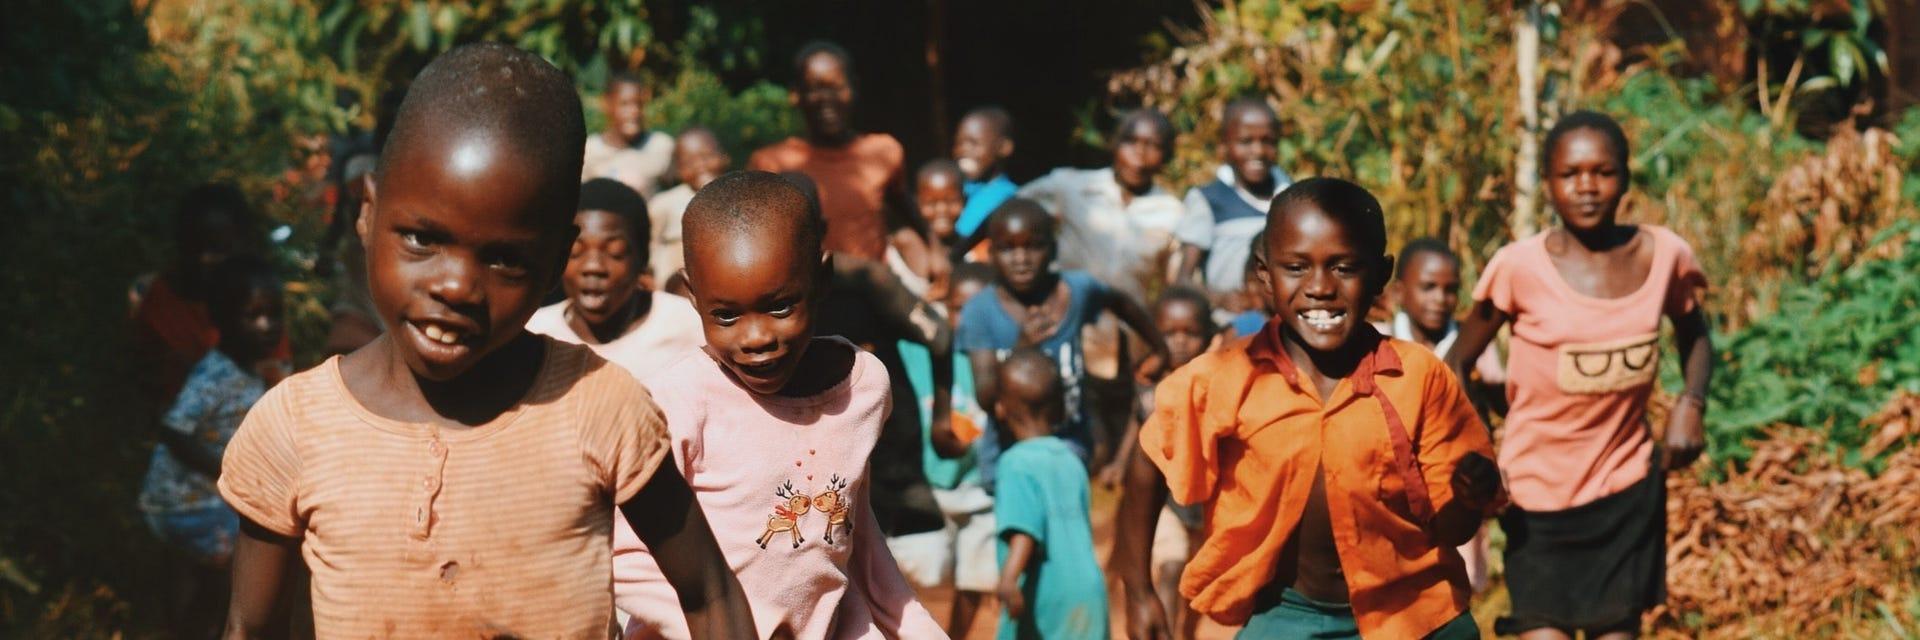 Education for children in Afrika is the goal of jambobukoba.com